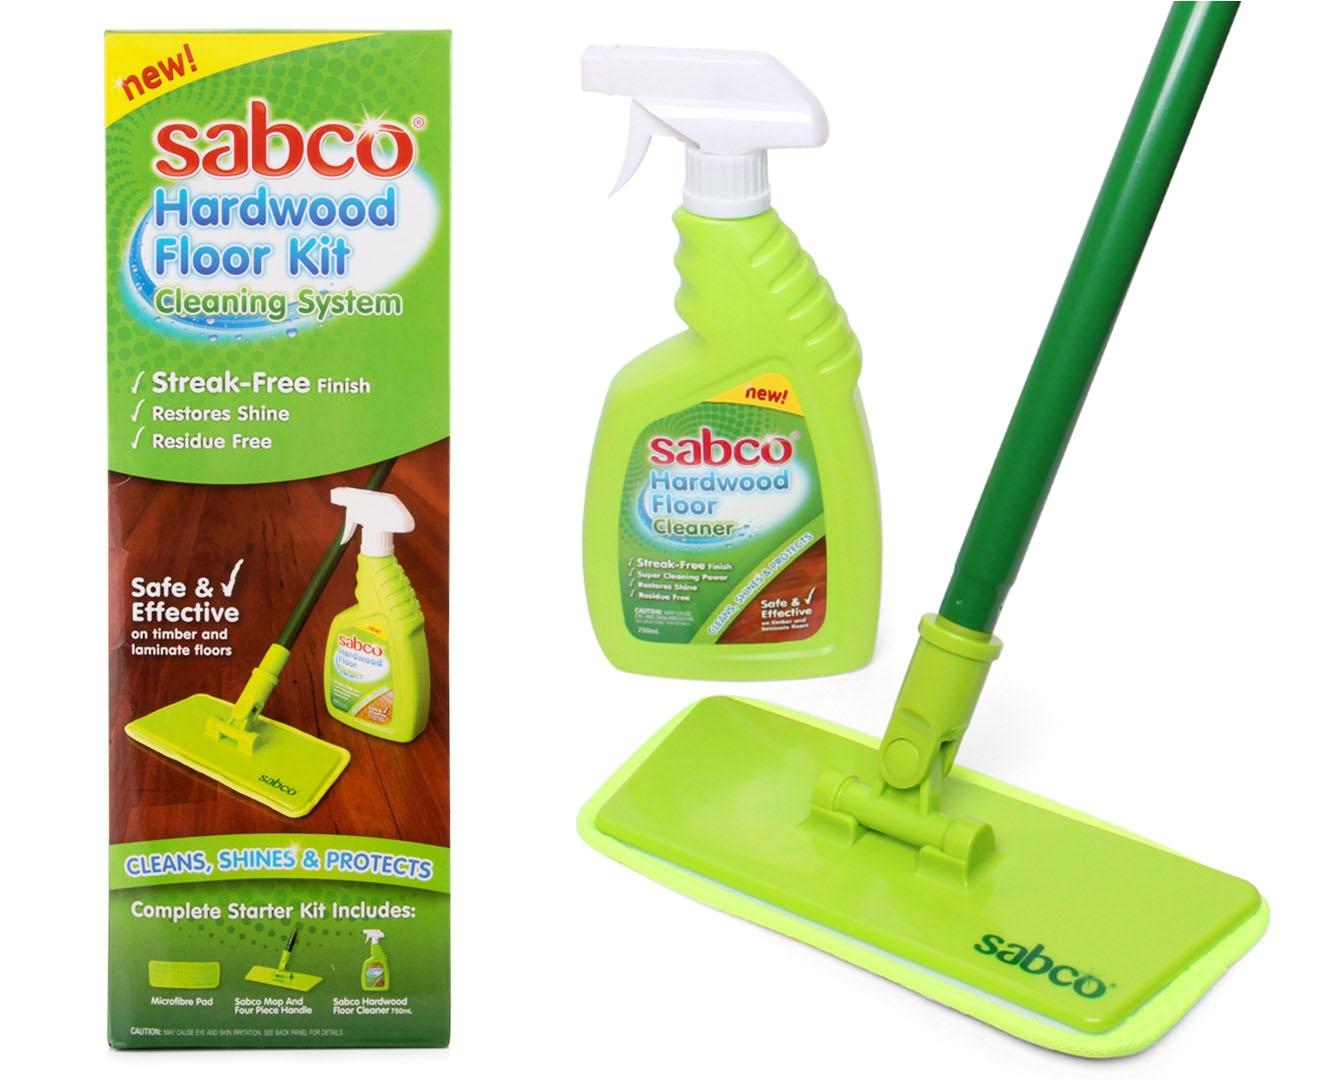 Bona Floor Products south Africa Sabco Hardwood Floor Kit Cleaning System 9310205360320 Ebay